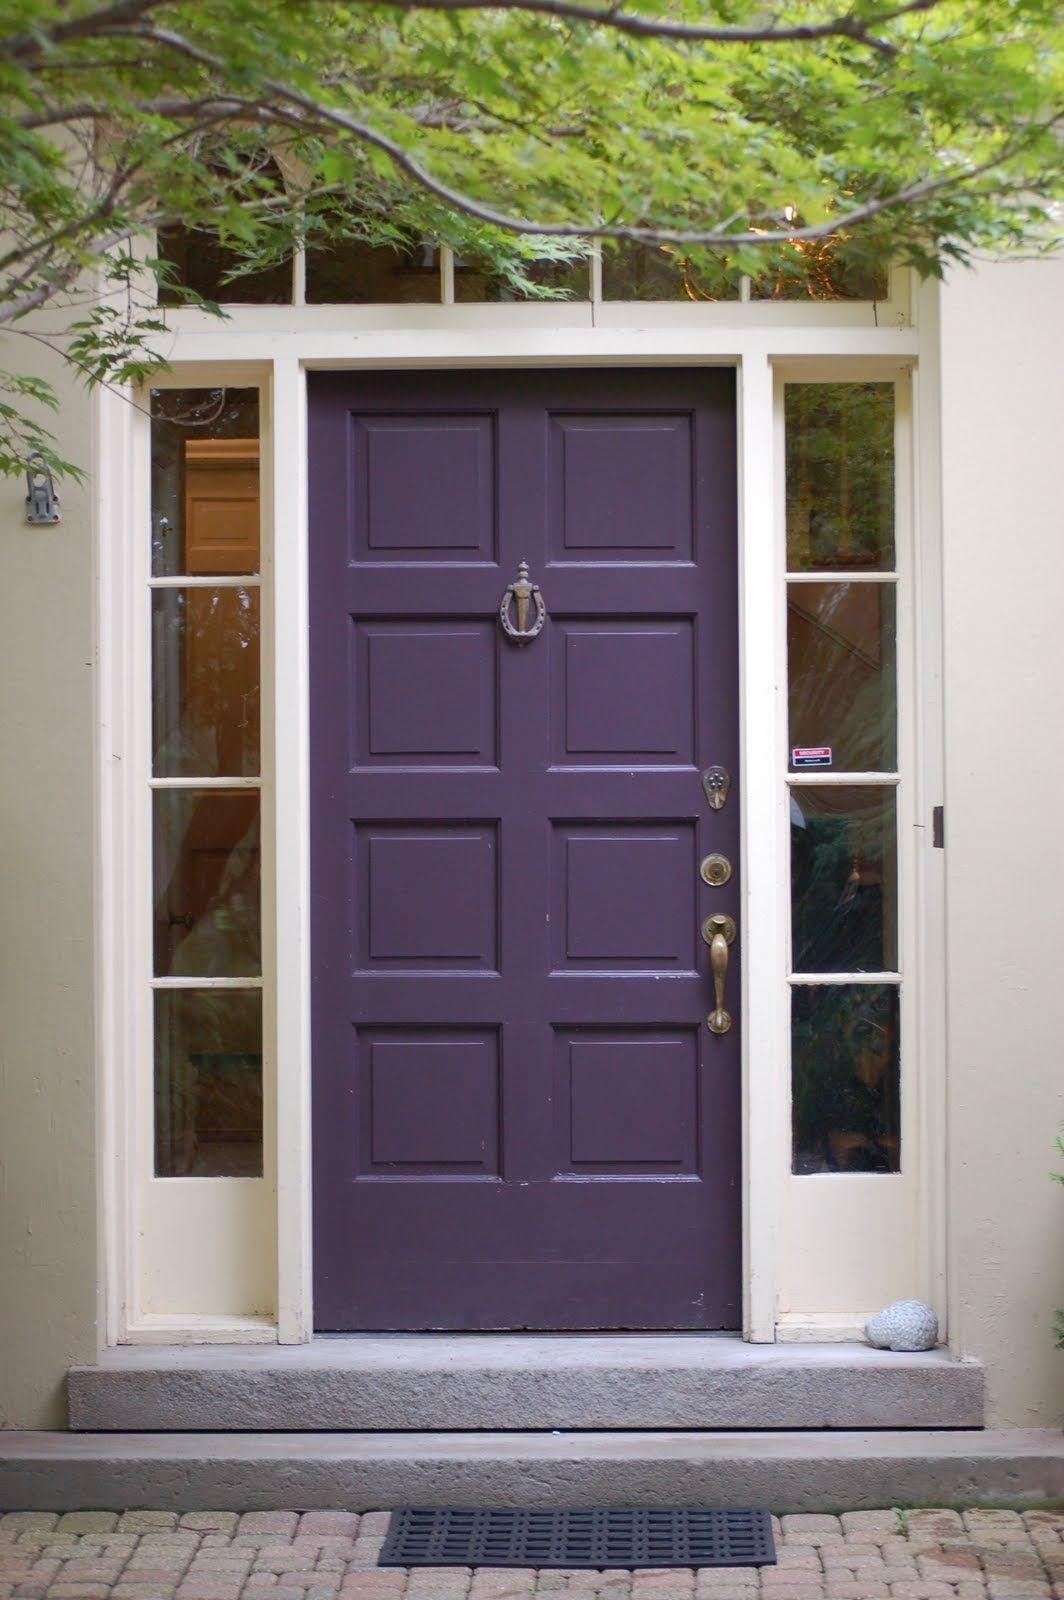 Benjamin moore regal select exterior soft gloss dark purple benjamin moore dark purple front door and shutters are plum perfect by benjamin moore rubansaba